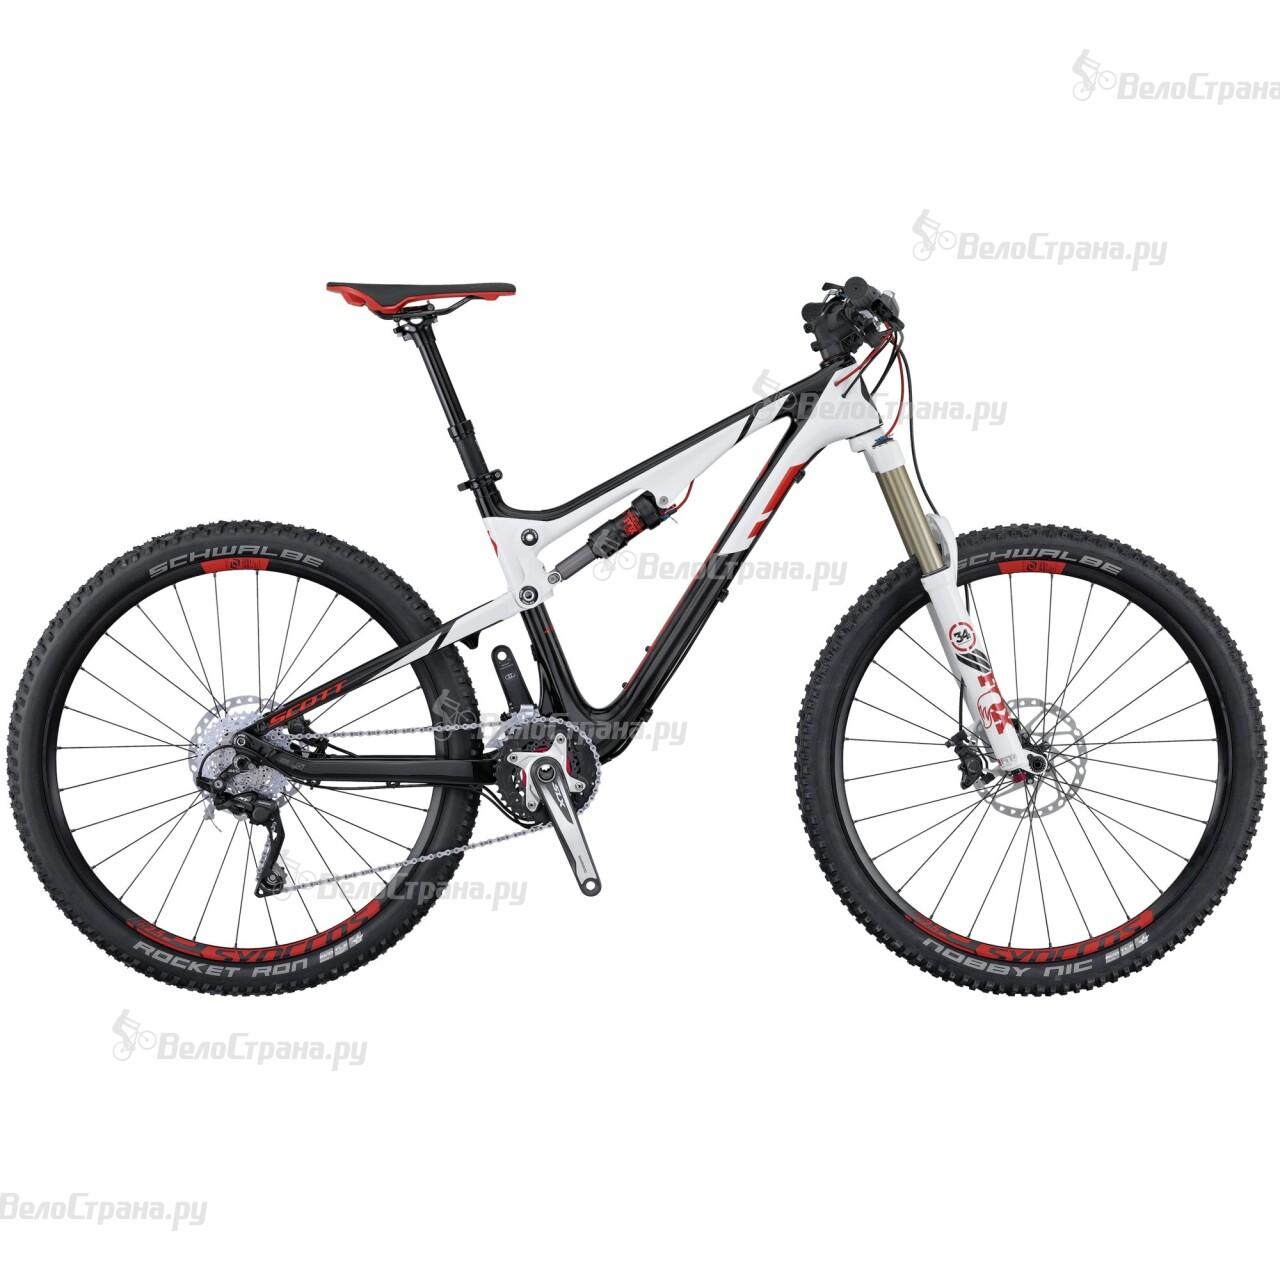 Велосипед Scott Genius 920 (2016) велосипед scott genius lt 700 tuned plus 2016